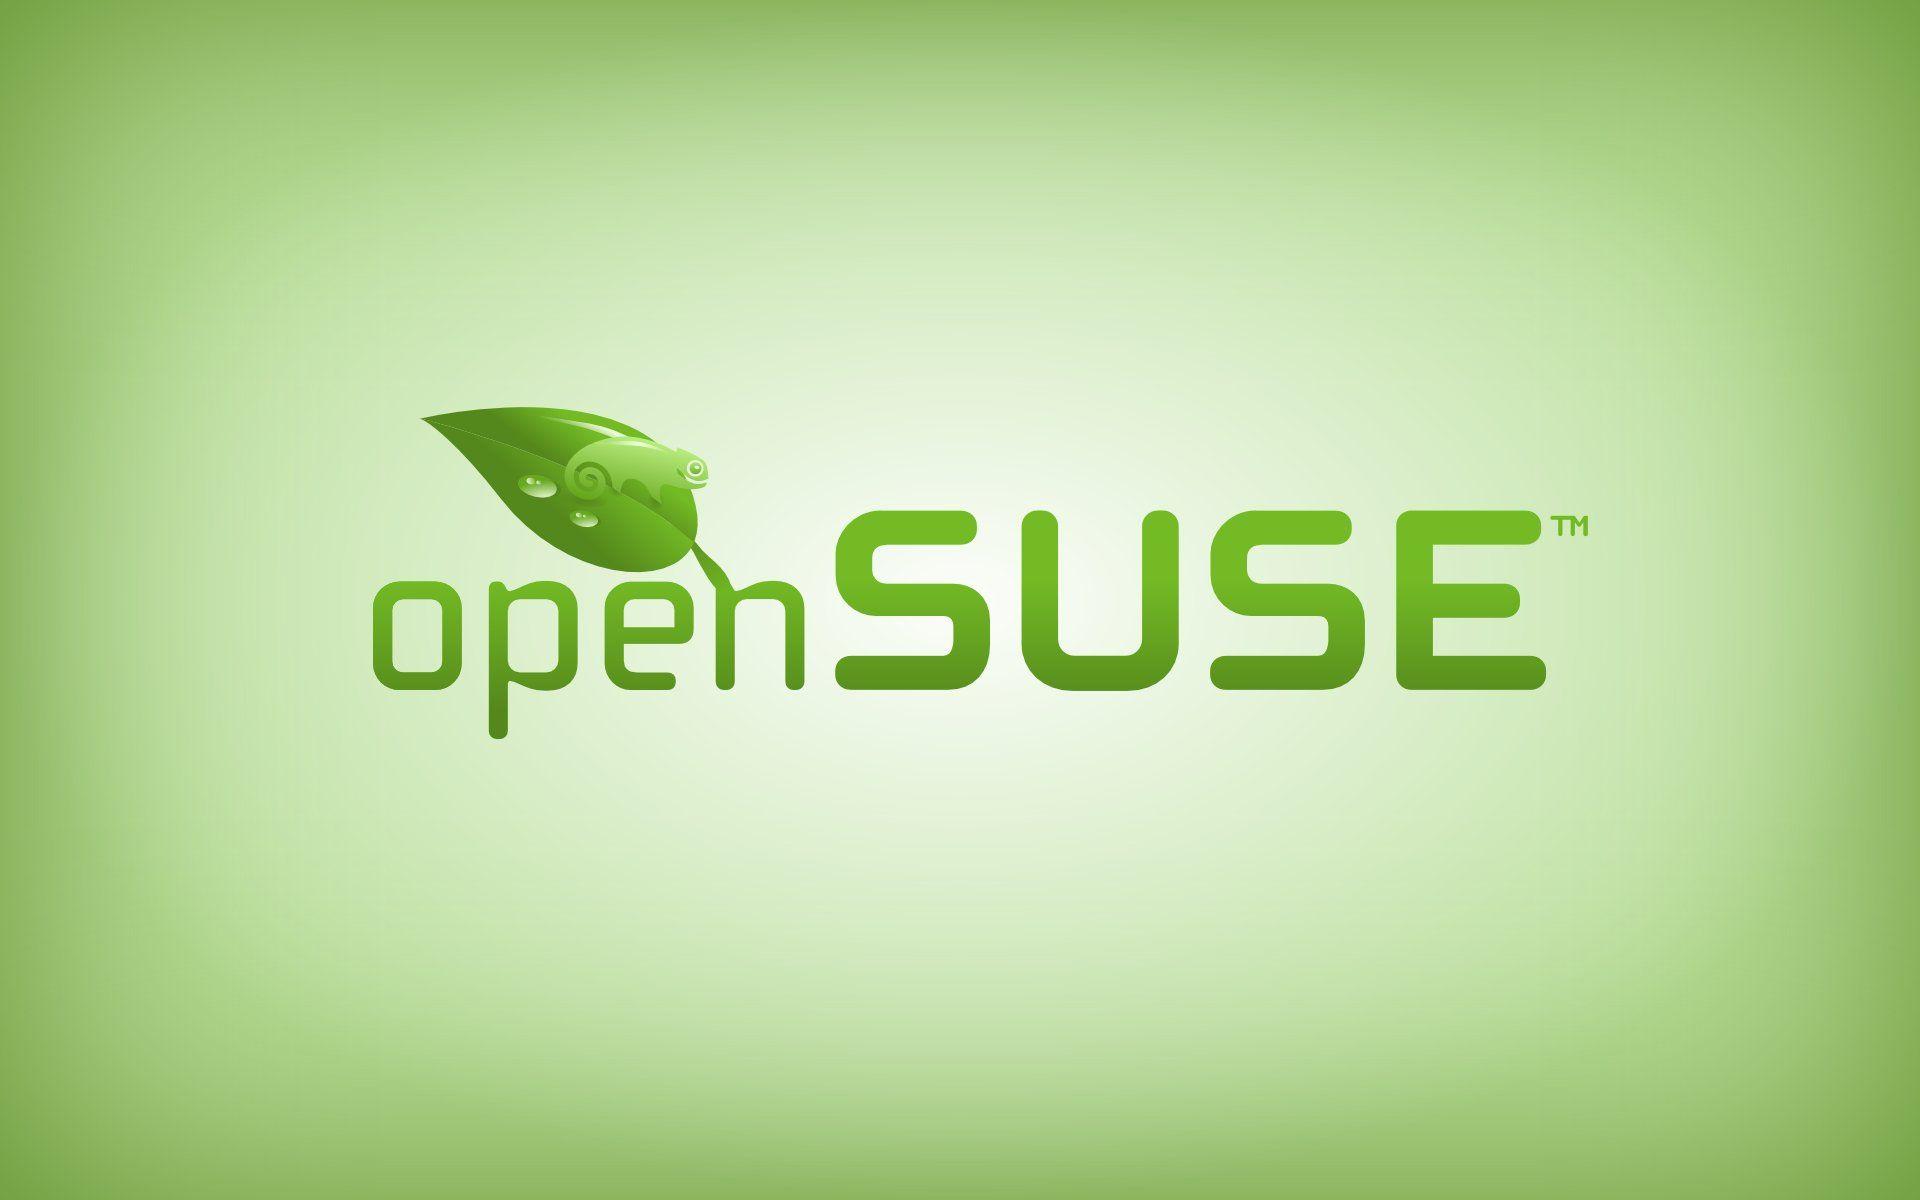 opensuse-wallpaper